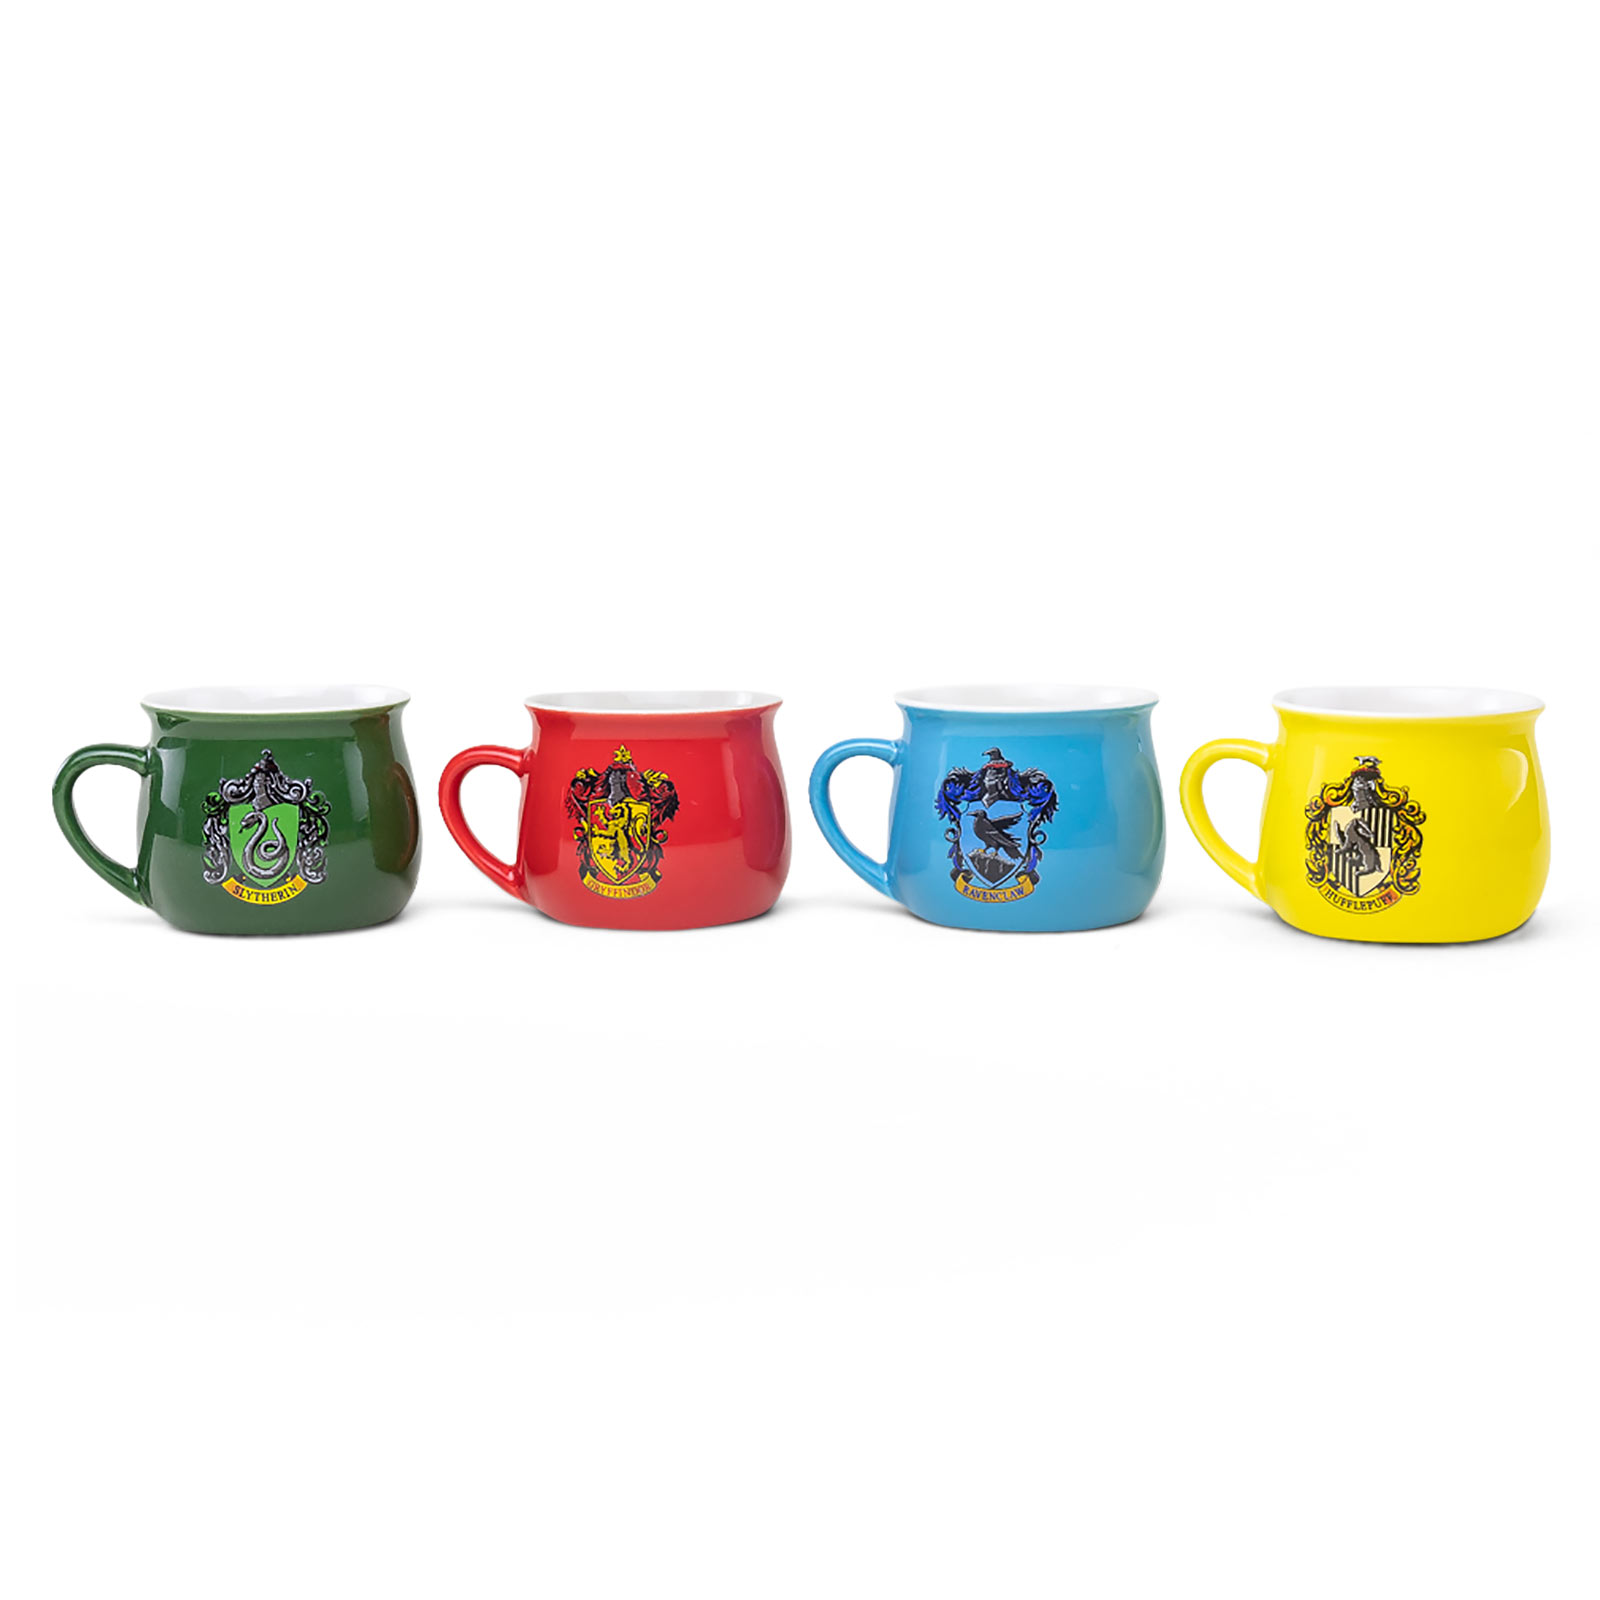 Harry Potter - Häuser Wappen Tassen-Set